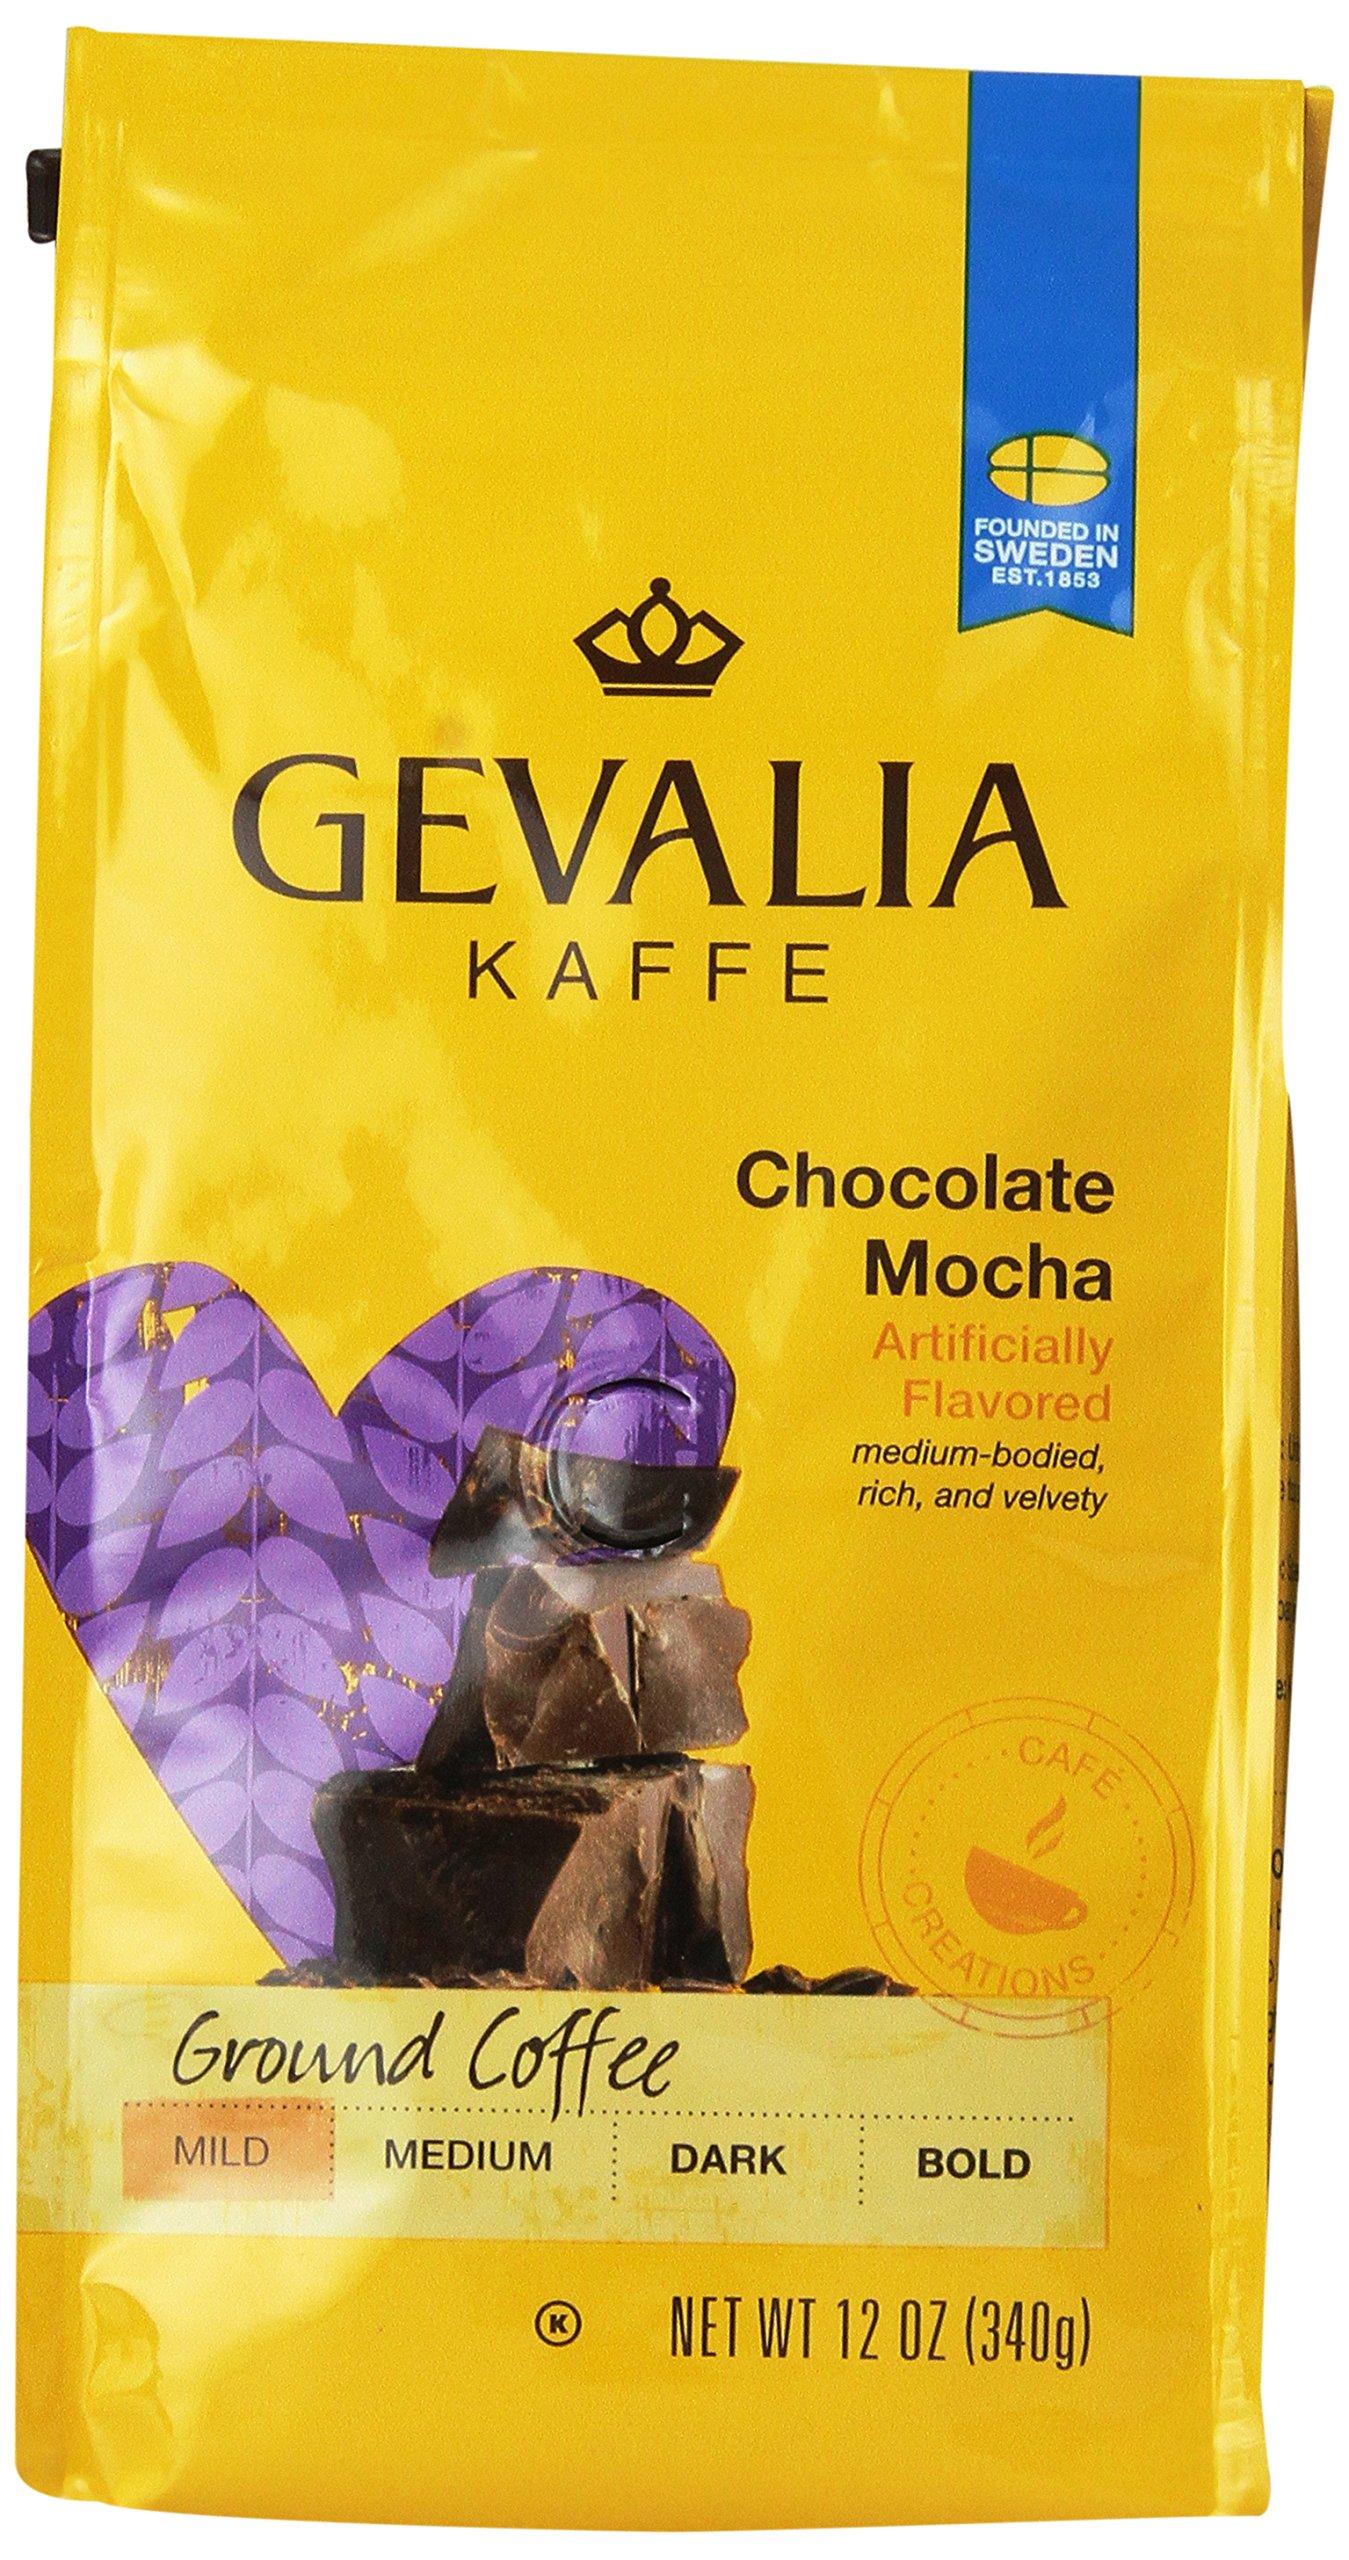 GEVALIA Chocolate Mocha, Mild, Ground Coffee, 12 Ounce, 6 Pack by Gevalia